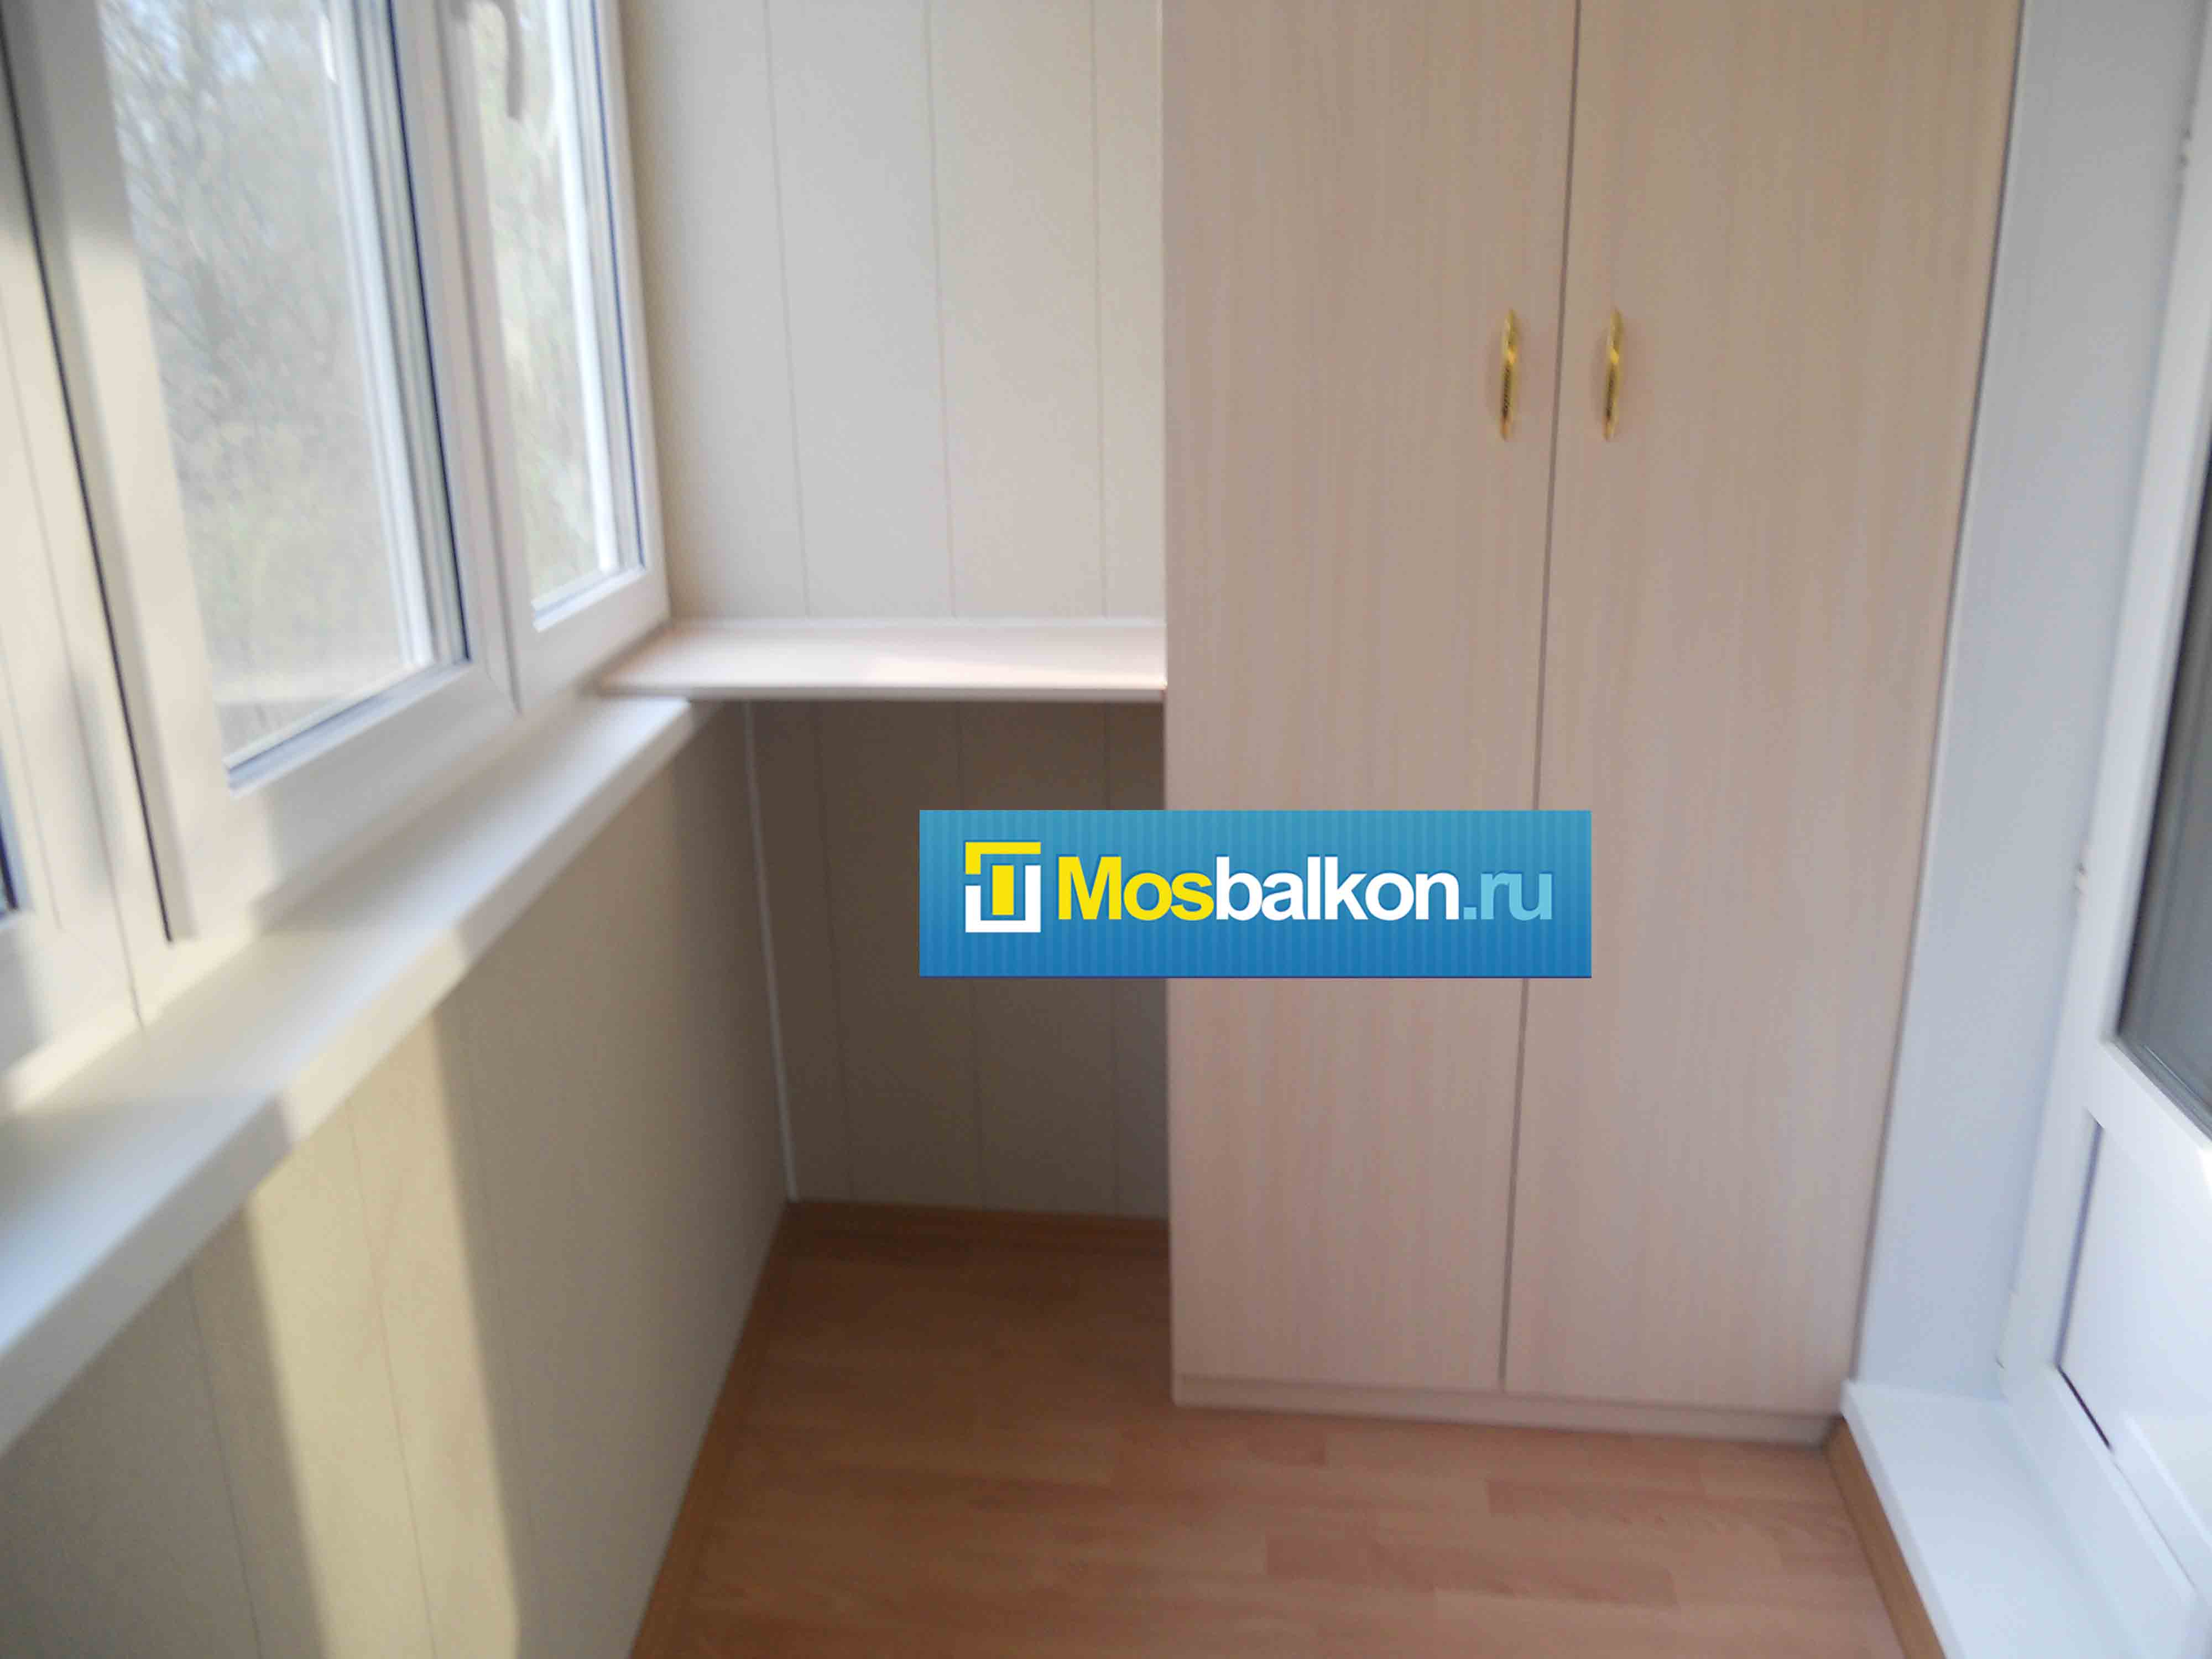 Установка шкафов на балконы и лоджии мосбалкон.ру.